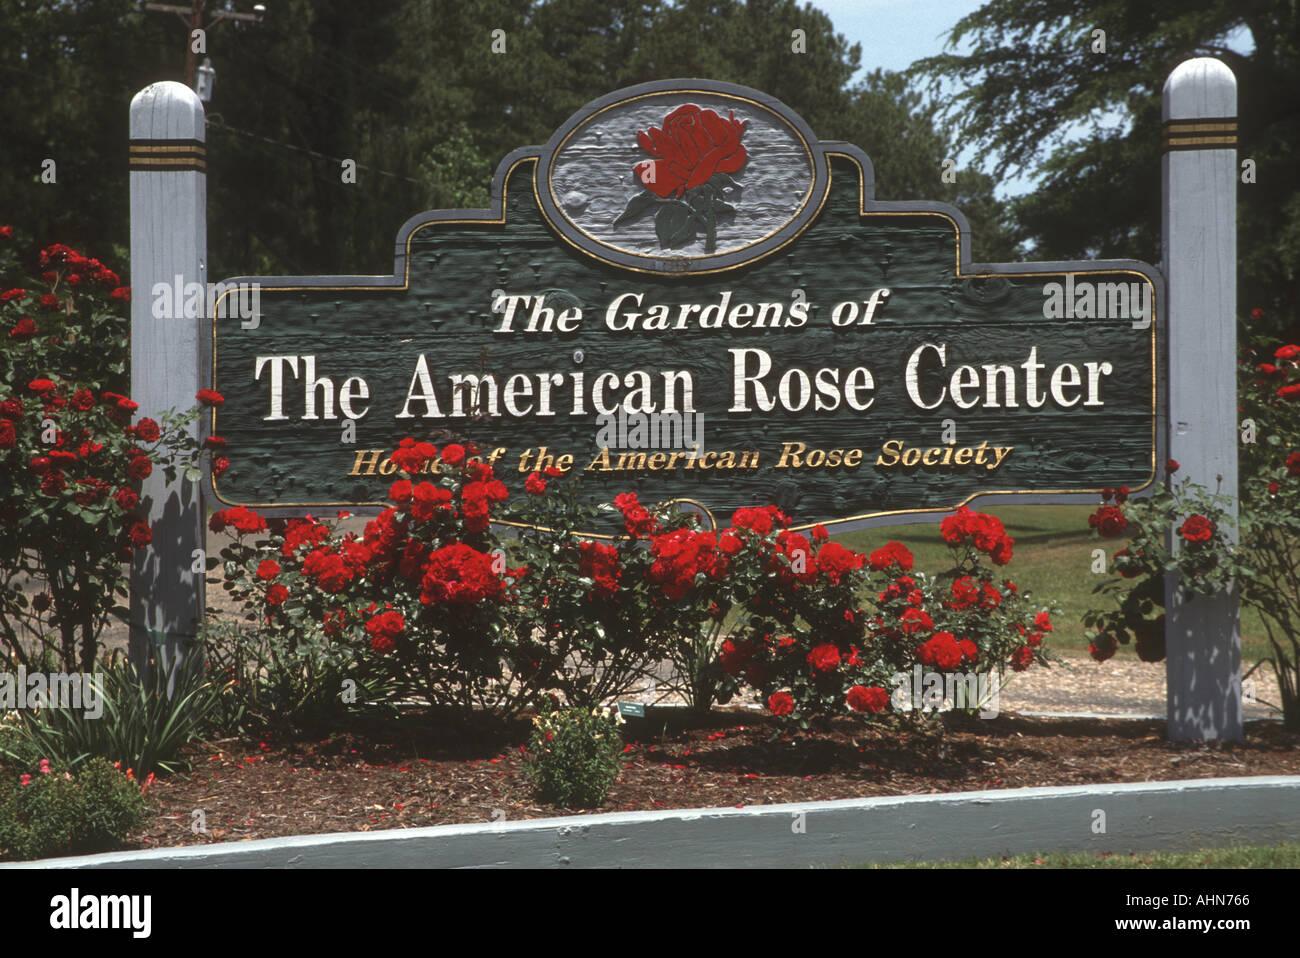 American Rose Society Gardens Shreveport Louisiana Stock Photo Royalty Free Image 2692965 Alamy